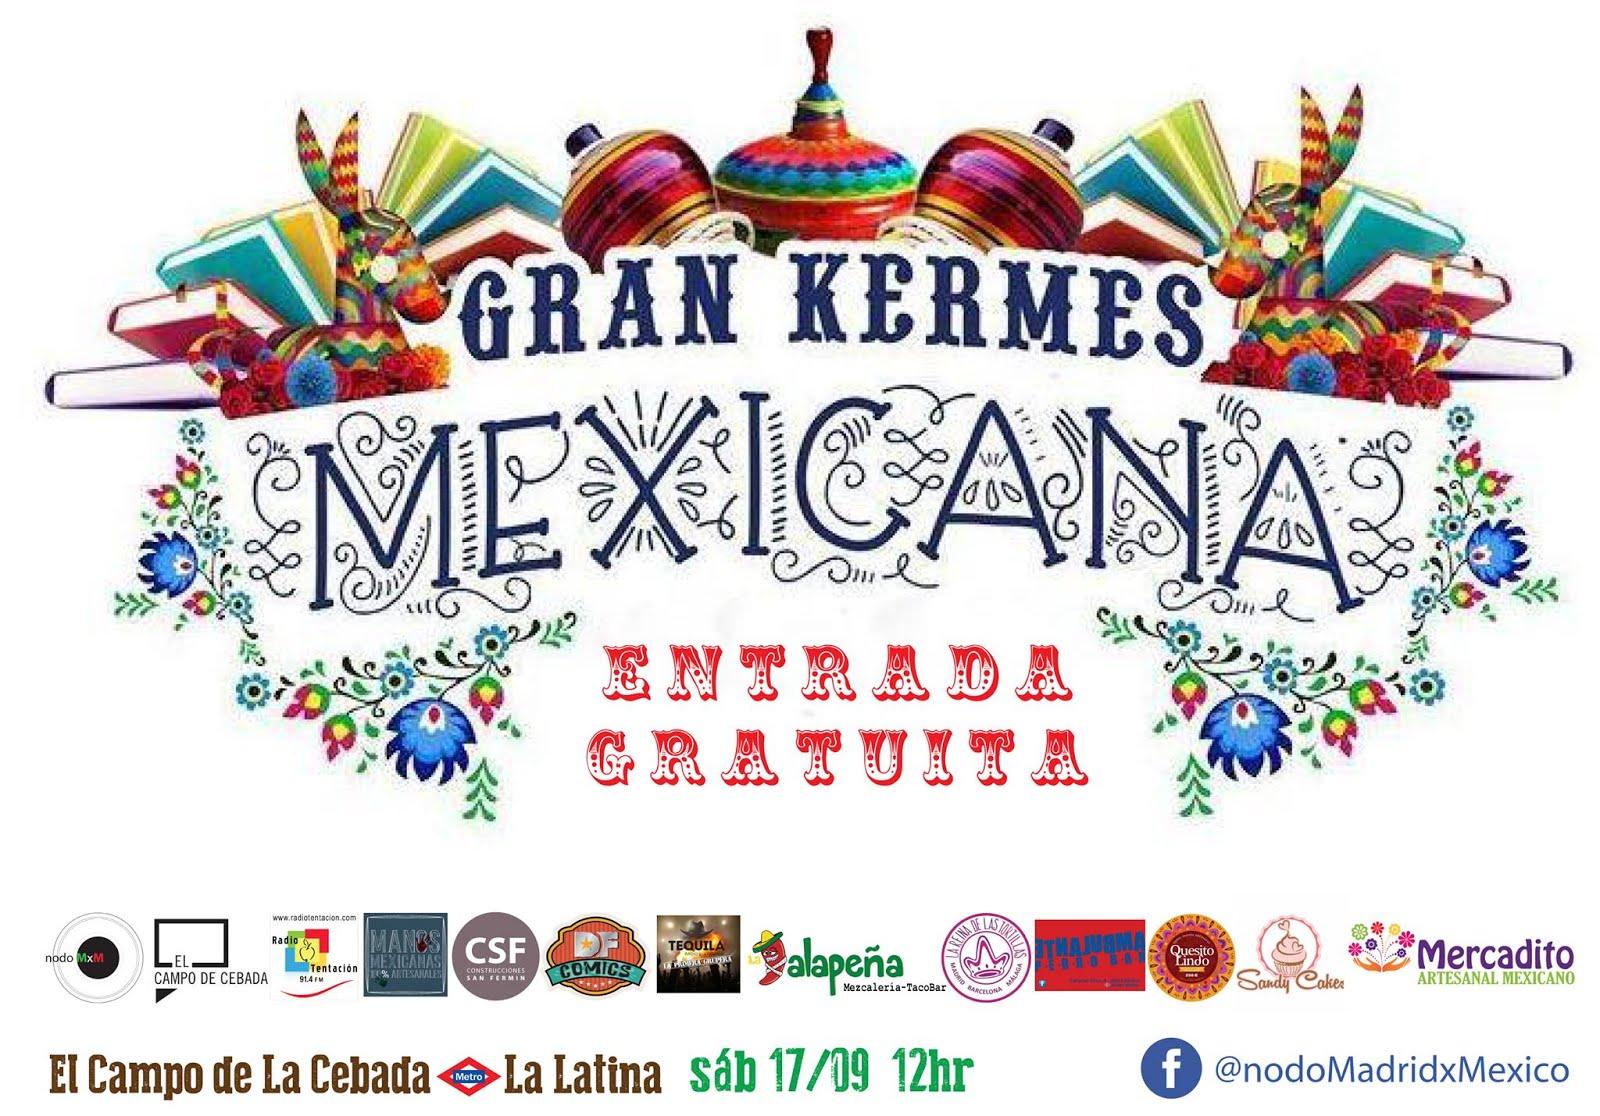 17 Sep Gran Kermes Mexicana En El Campo De La Cebada Don T